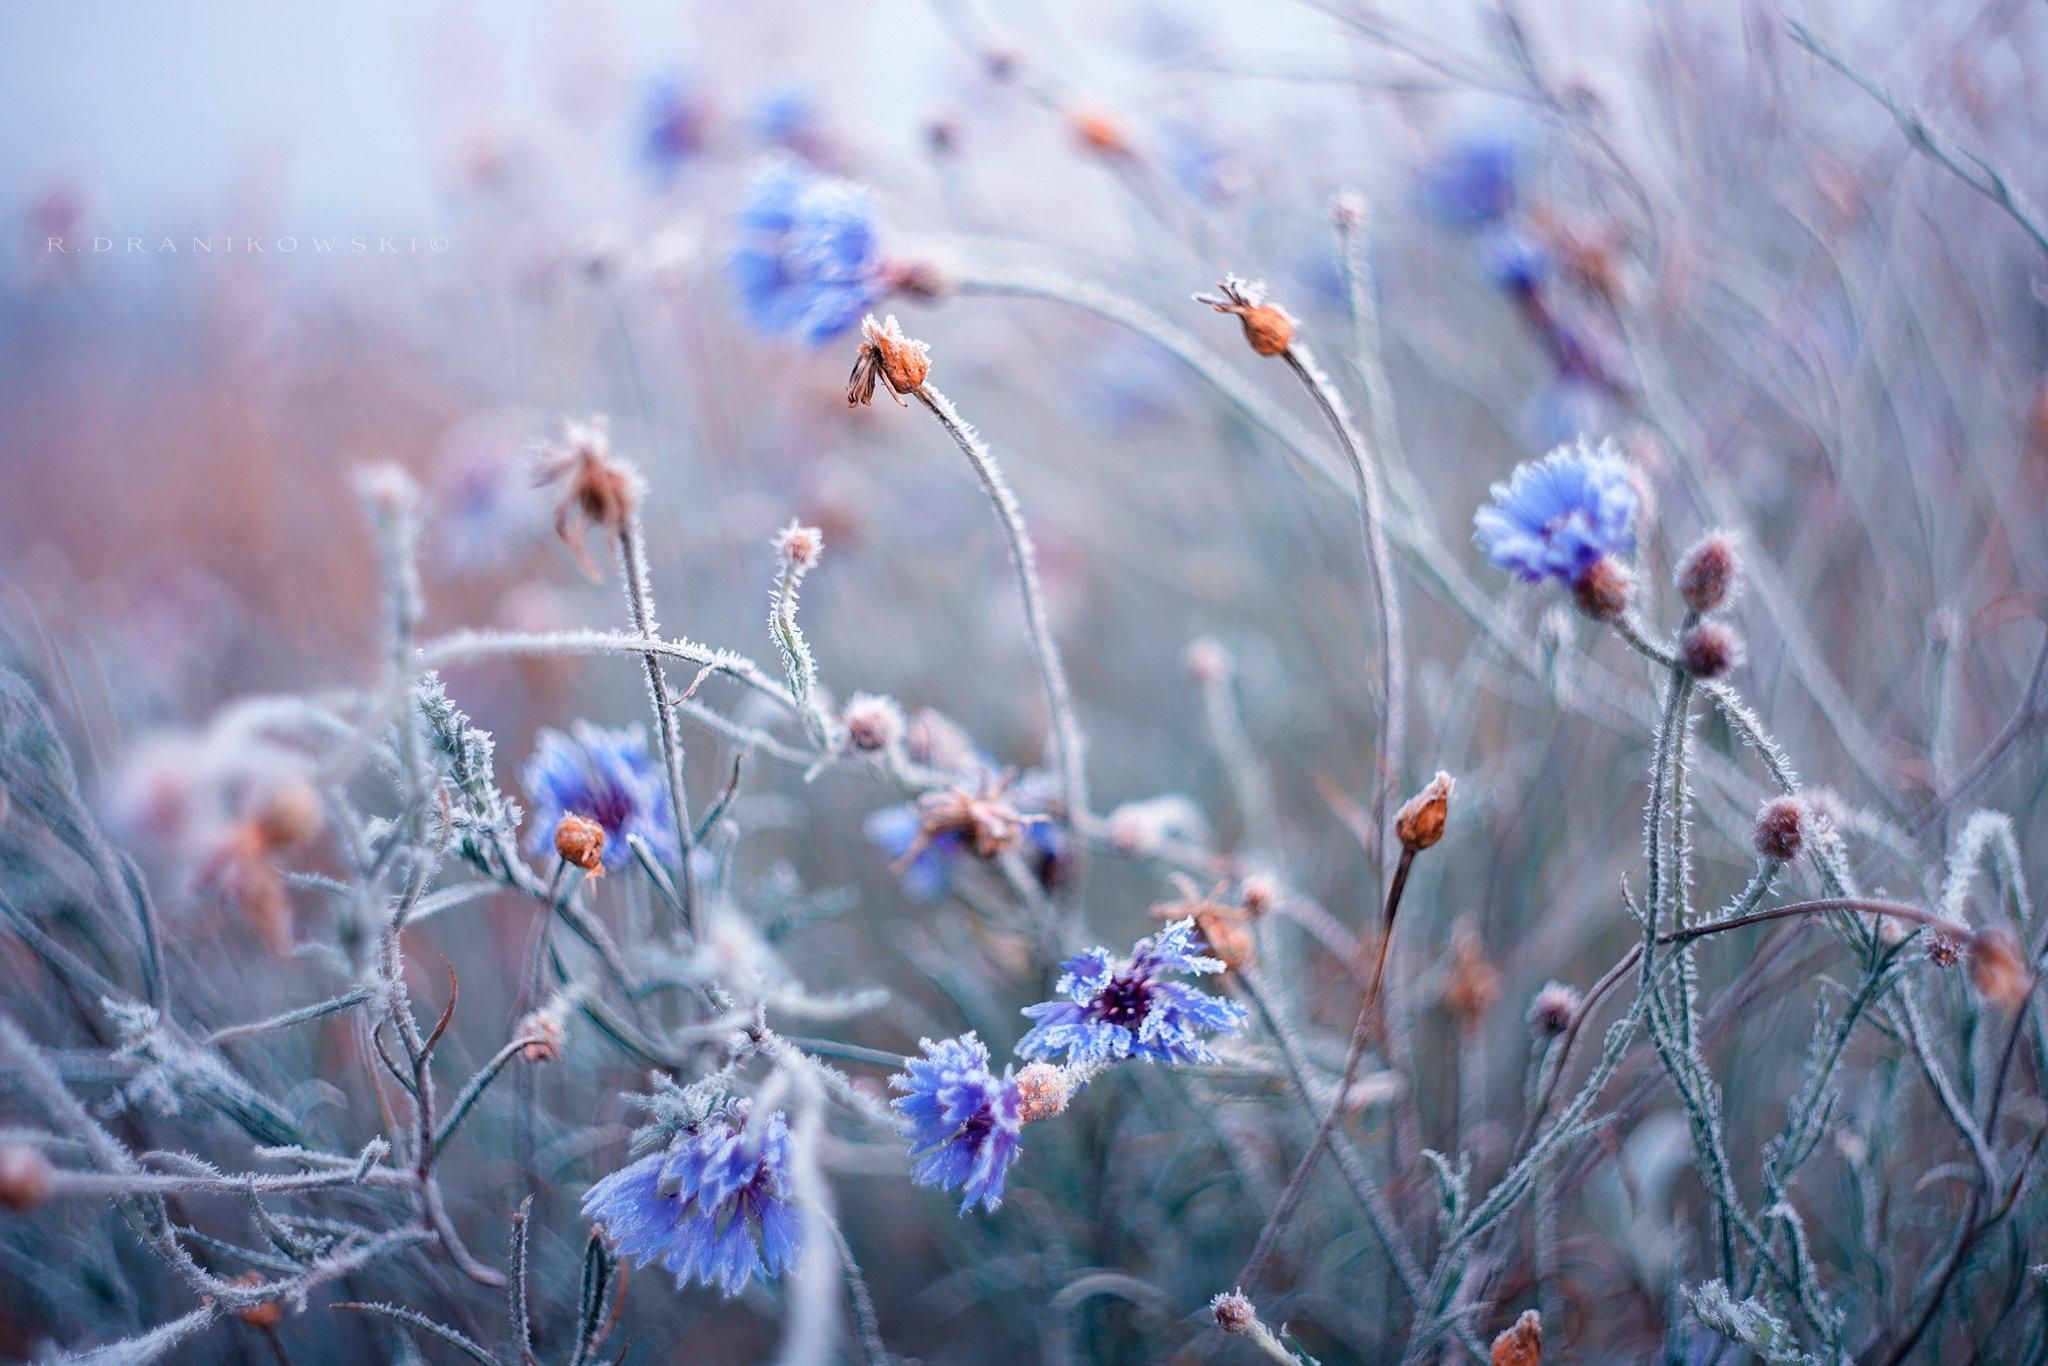 васильки centaurea cyanus cornflower blue flowers bokeh dranikowski macro m42 helios art, Radoslaw Dranikowski